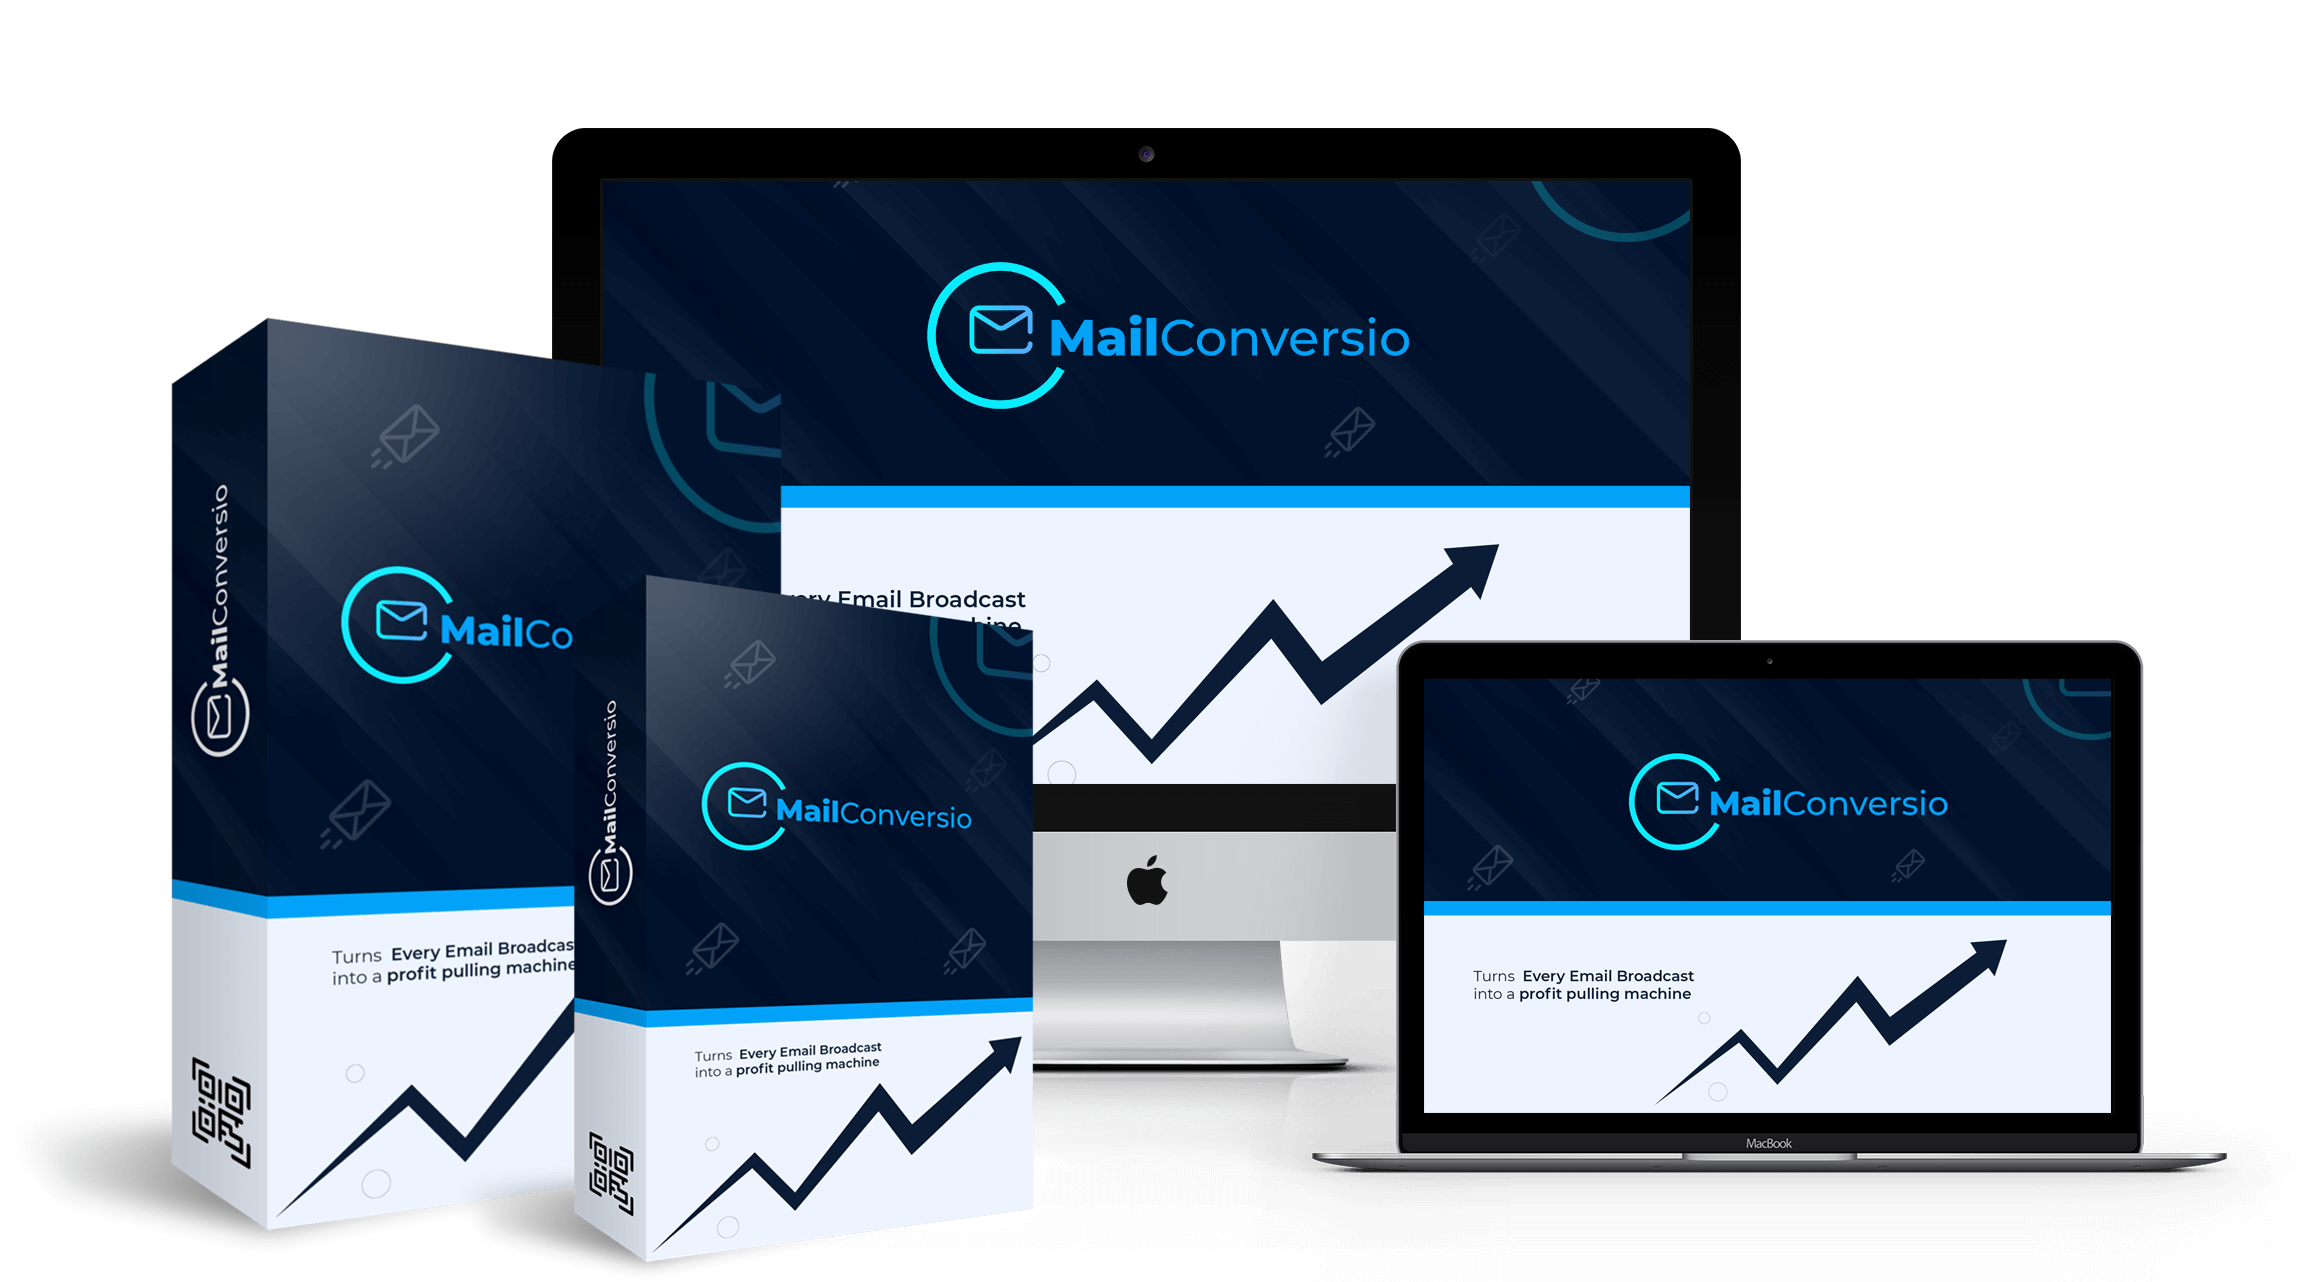 mailconversio review